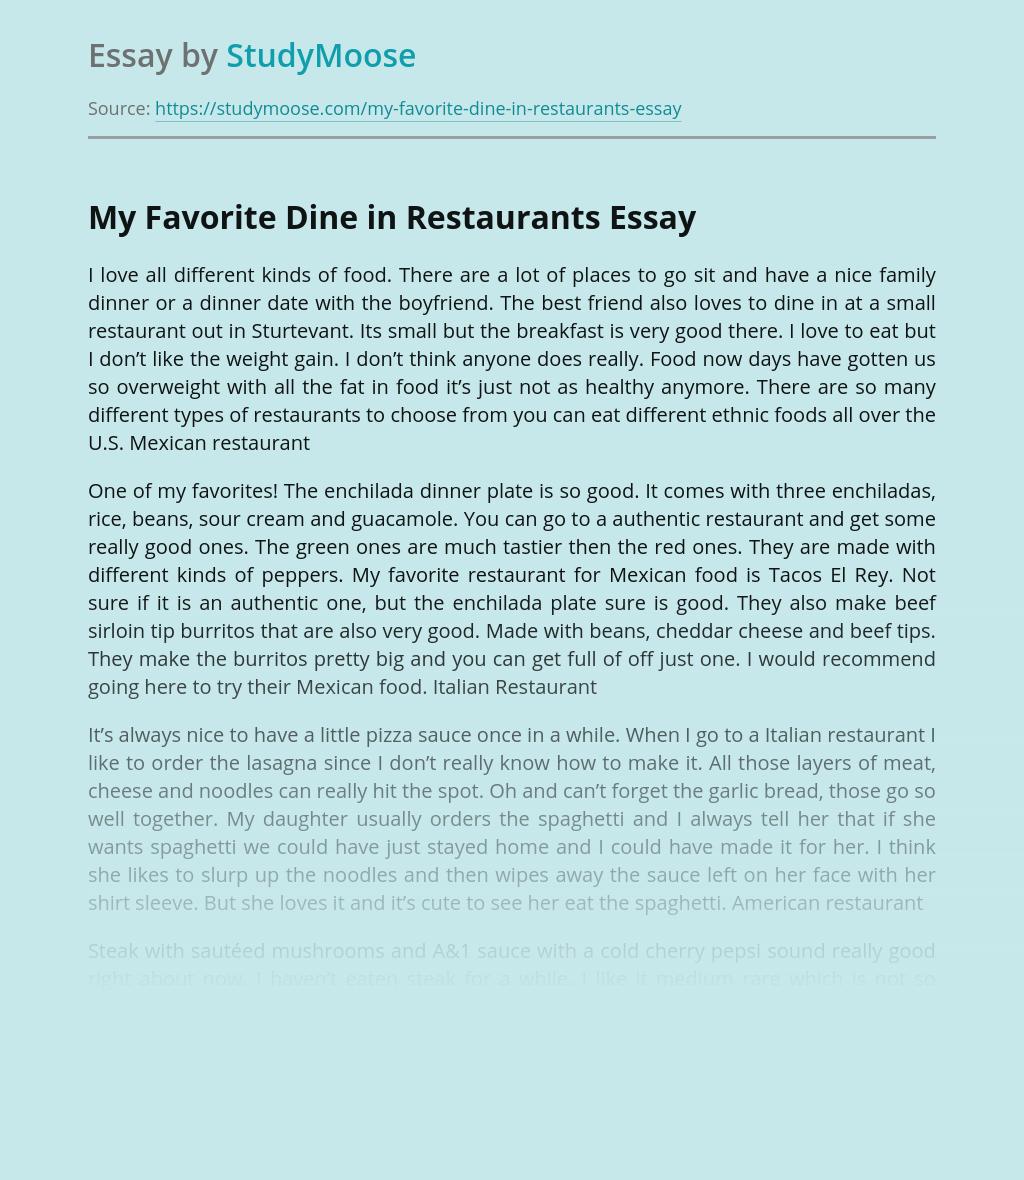 My Favorite Dine in Restaurants